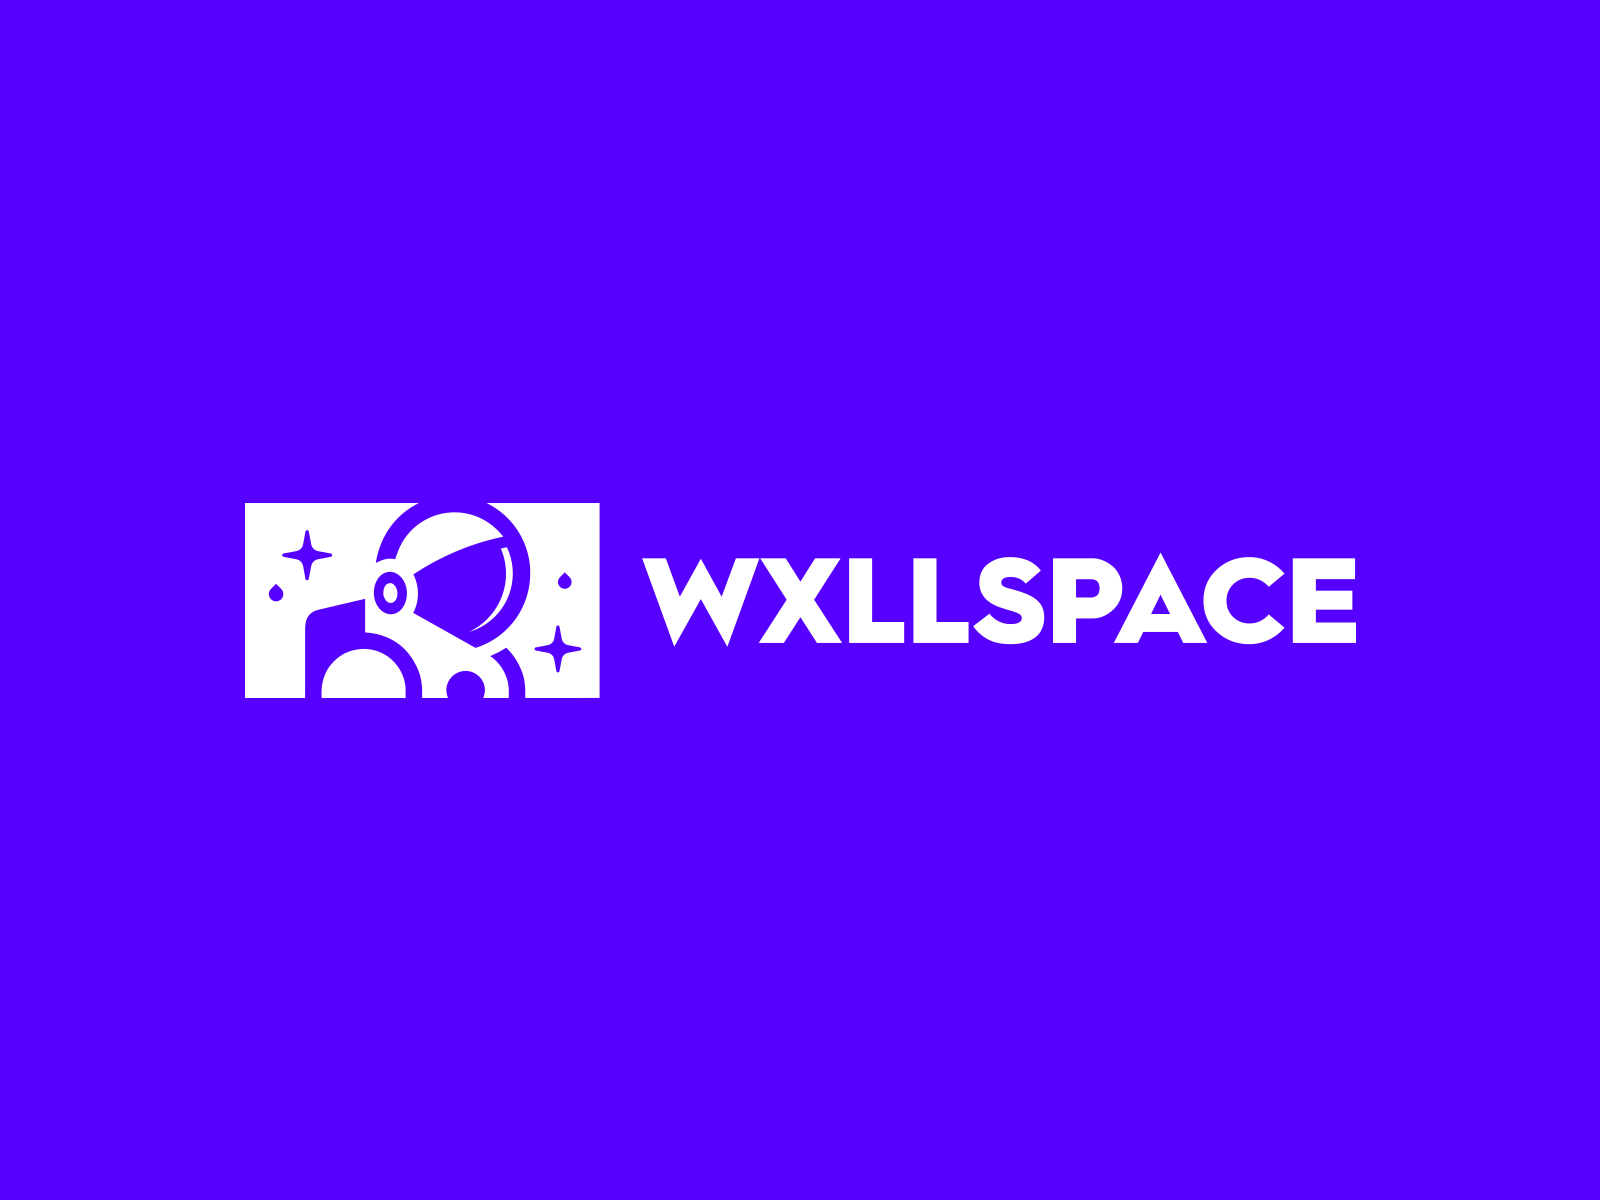 WxllSpace - Branding, Identity & Logo Design